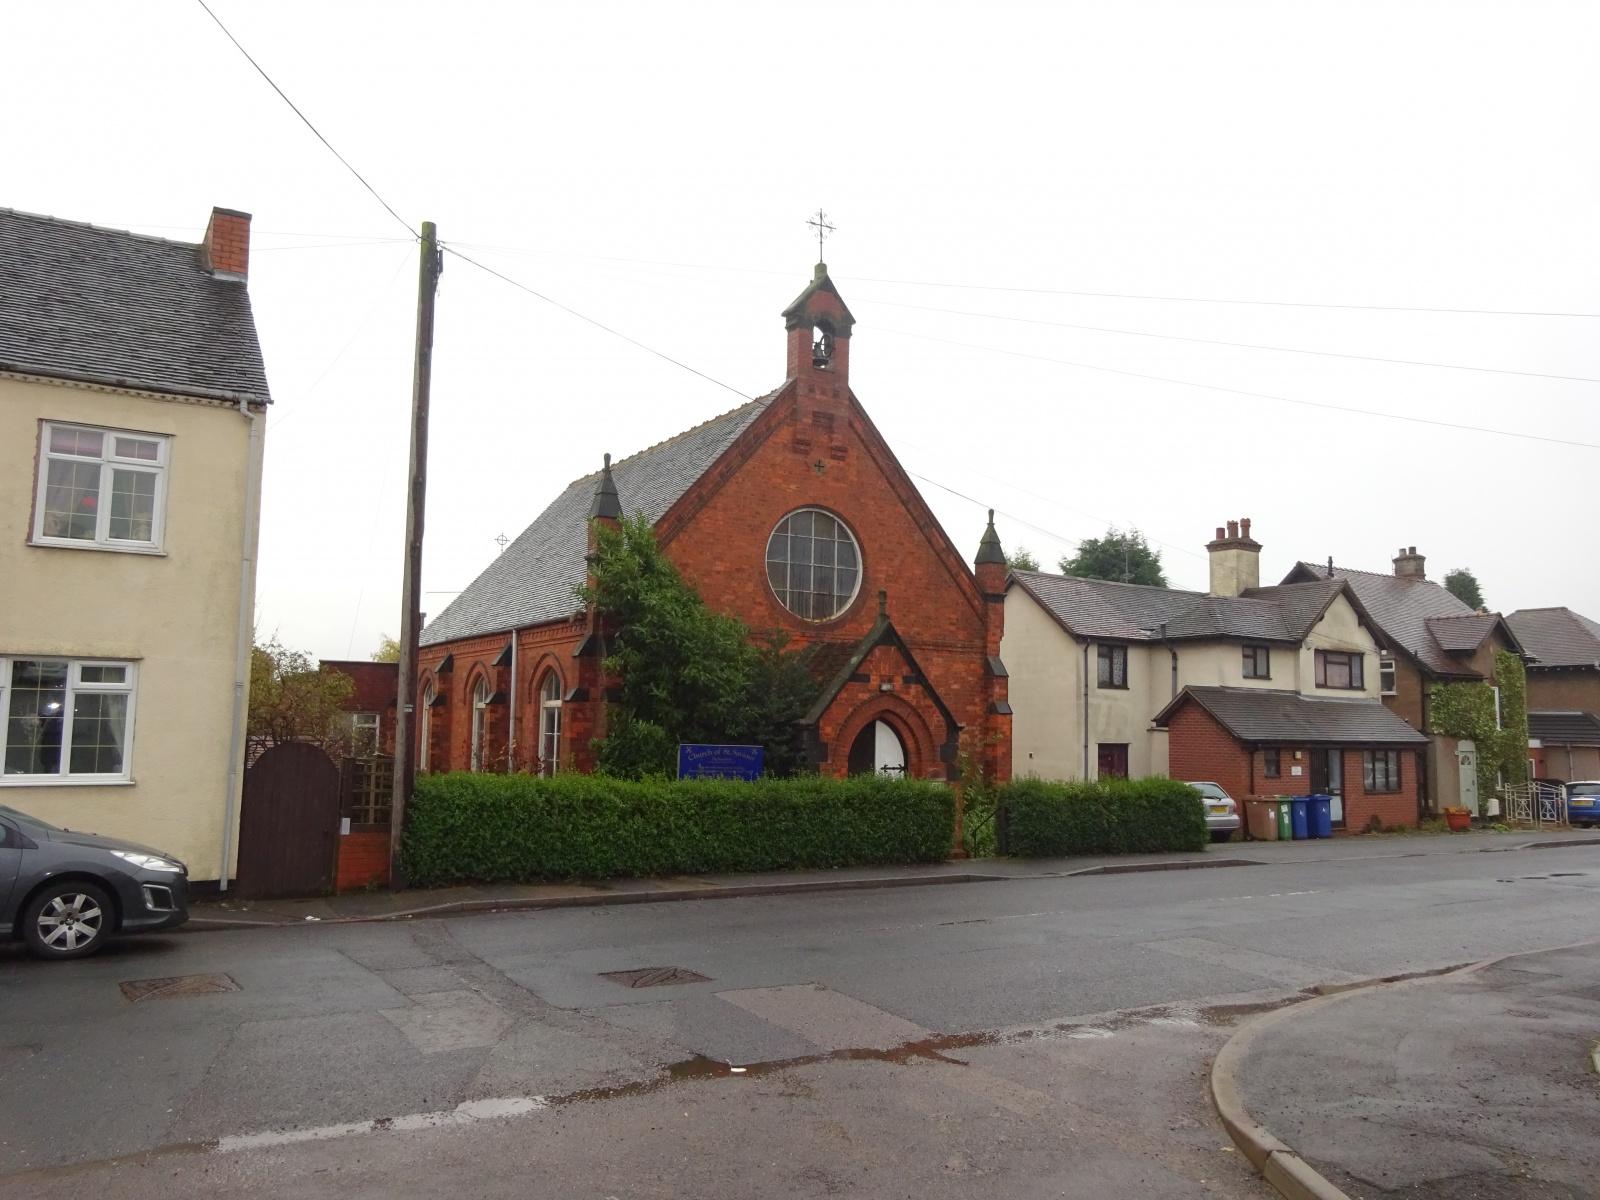 St Saviours Church, High Mount Street, Hednesford, Staffordshire